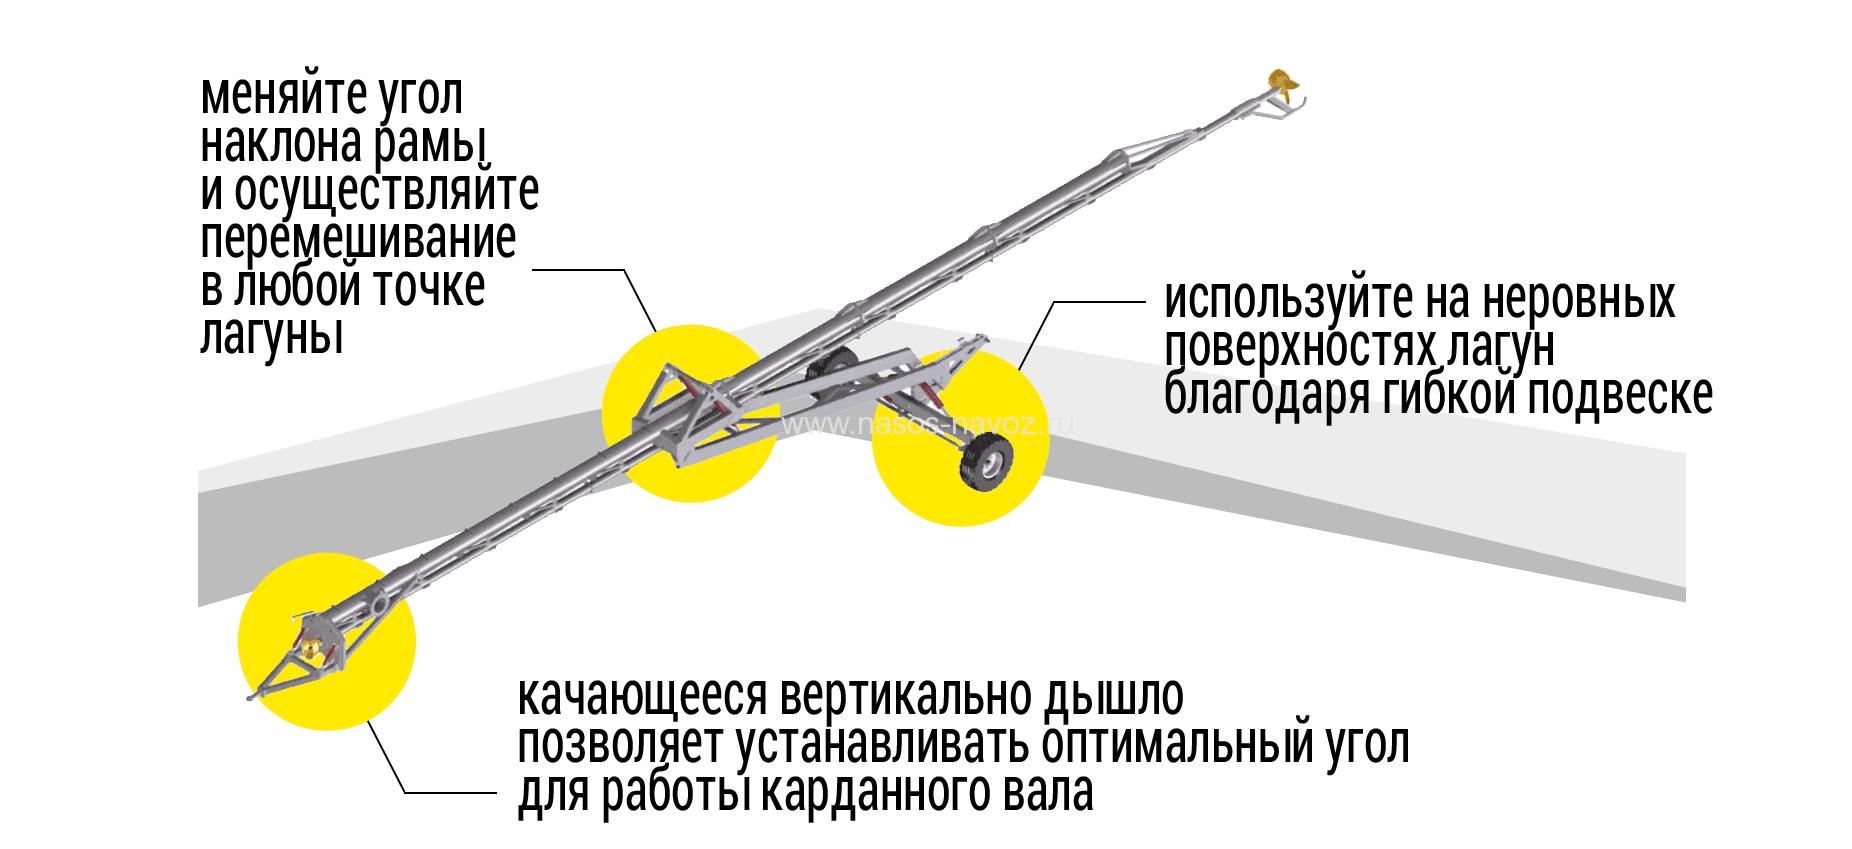 Преимущества лагунной мешалка 22 метра